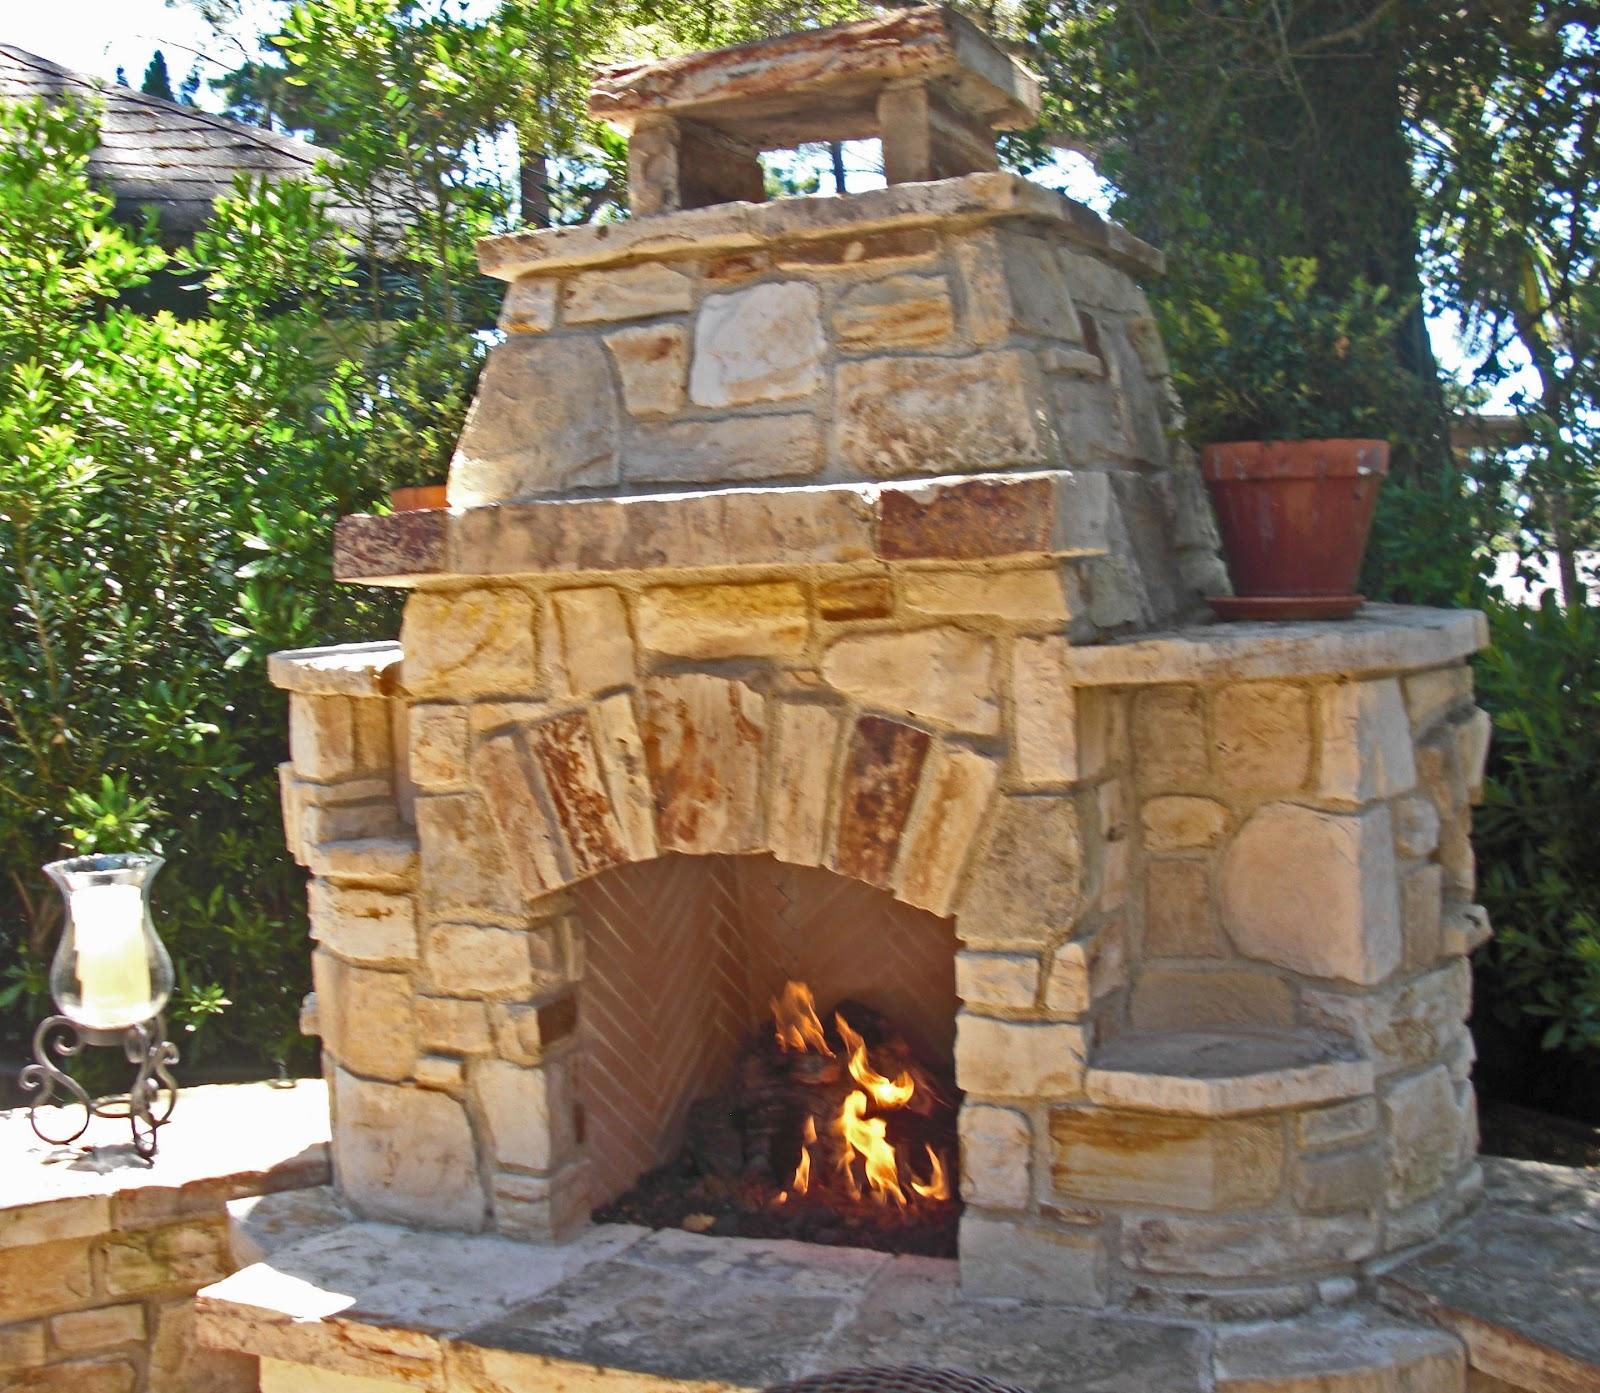 carmel house and garden tour 2012 hugh comstock adventures of